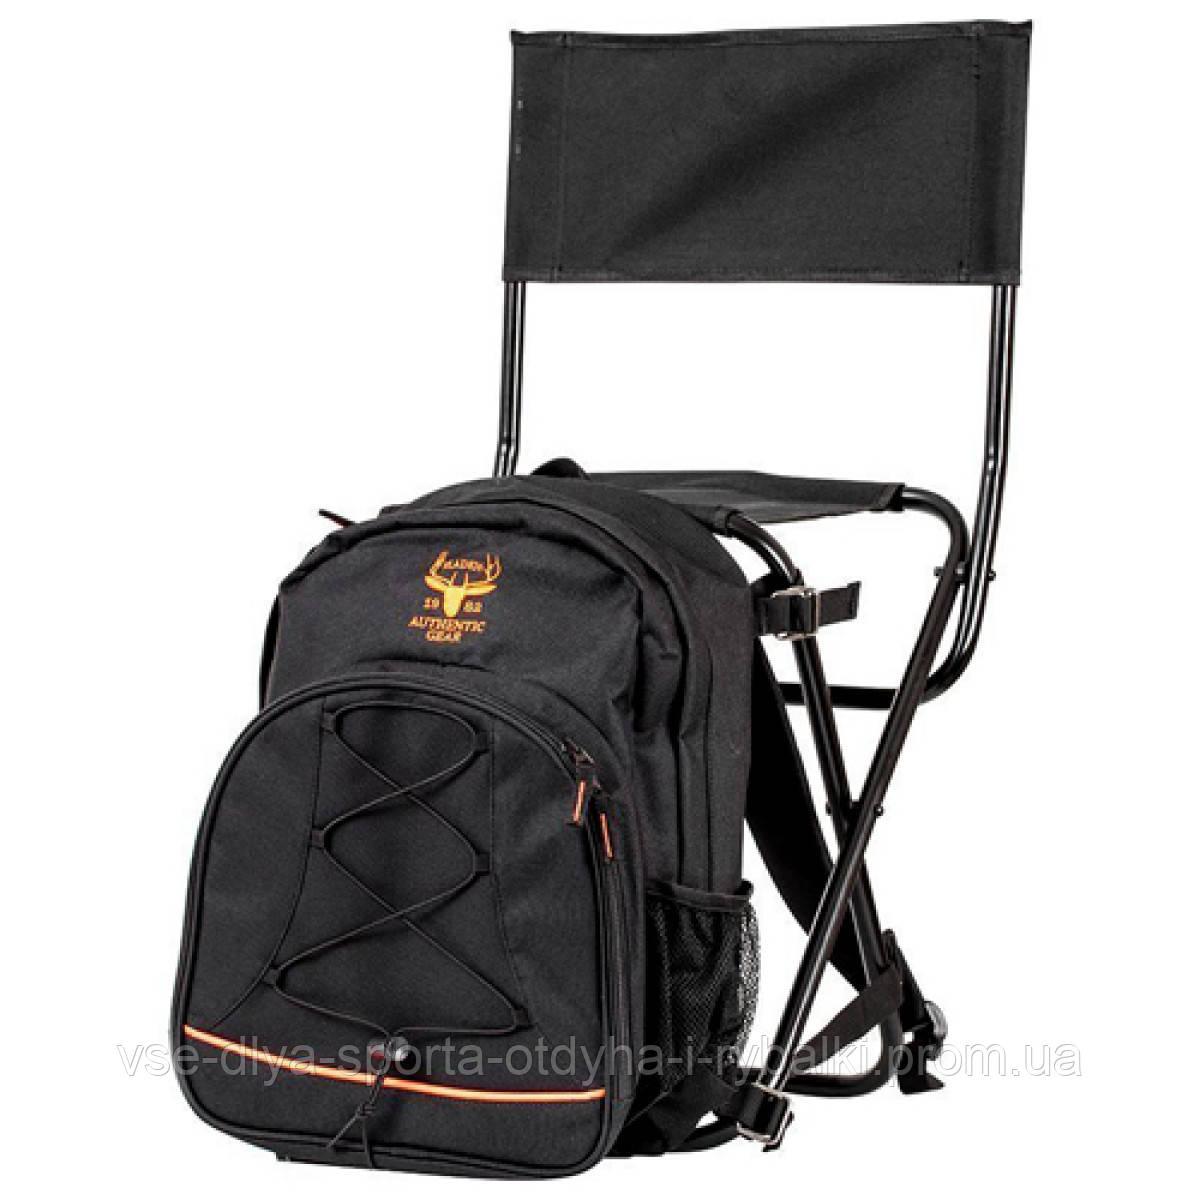 Стул-рюкзак Fladen Chair Bag Black Gold Authentic XL